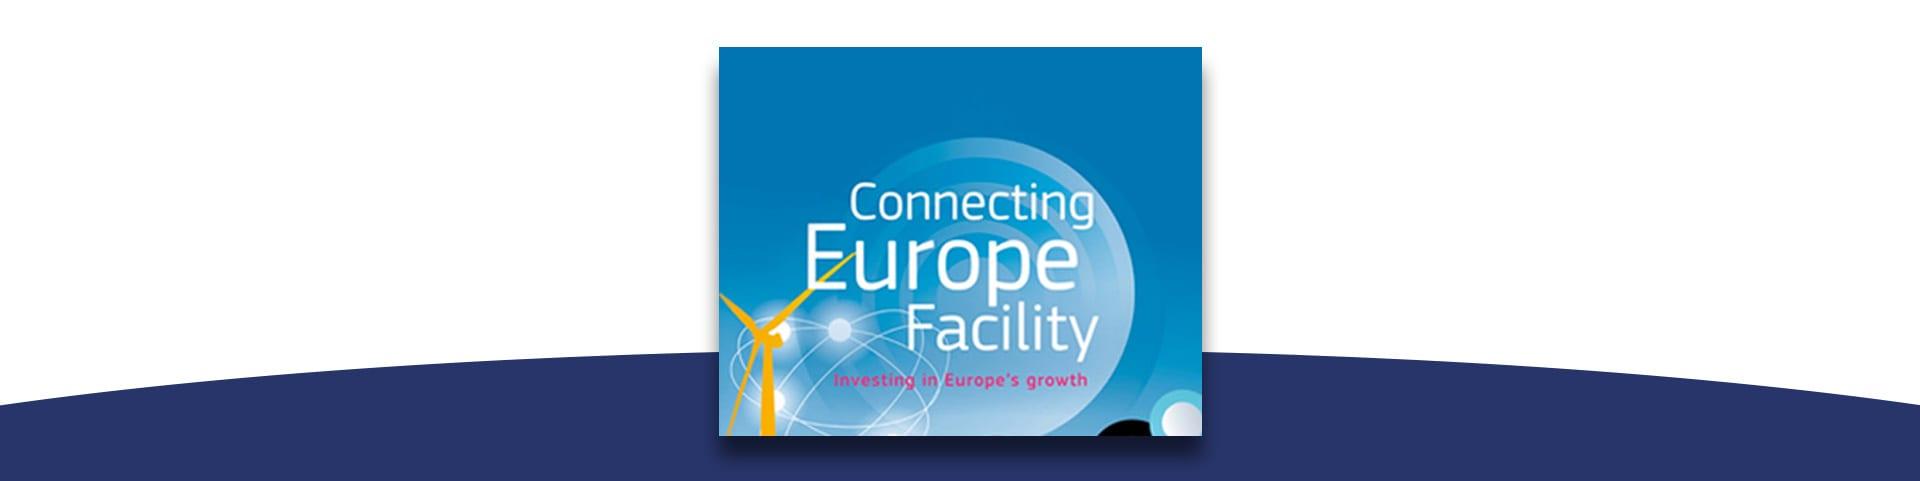 Connecting Europa Facilityno alt text set su stradedeuropa.eu